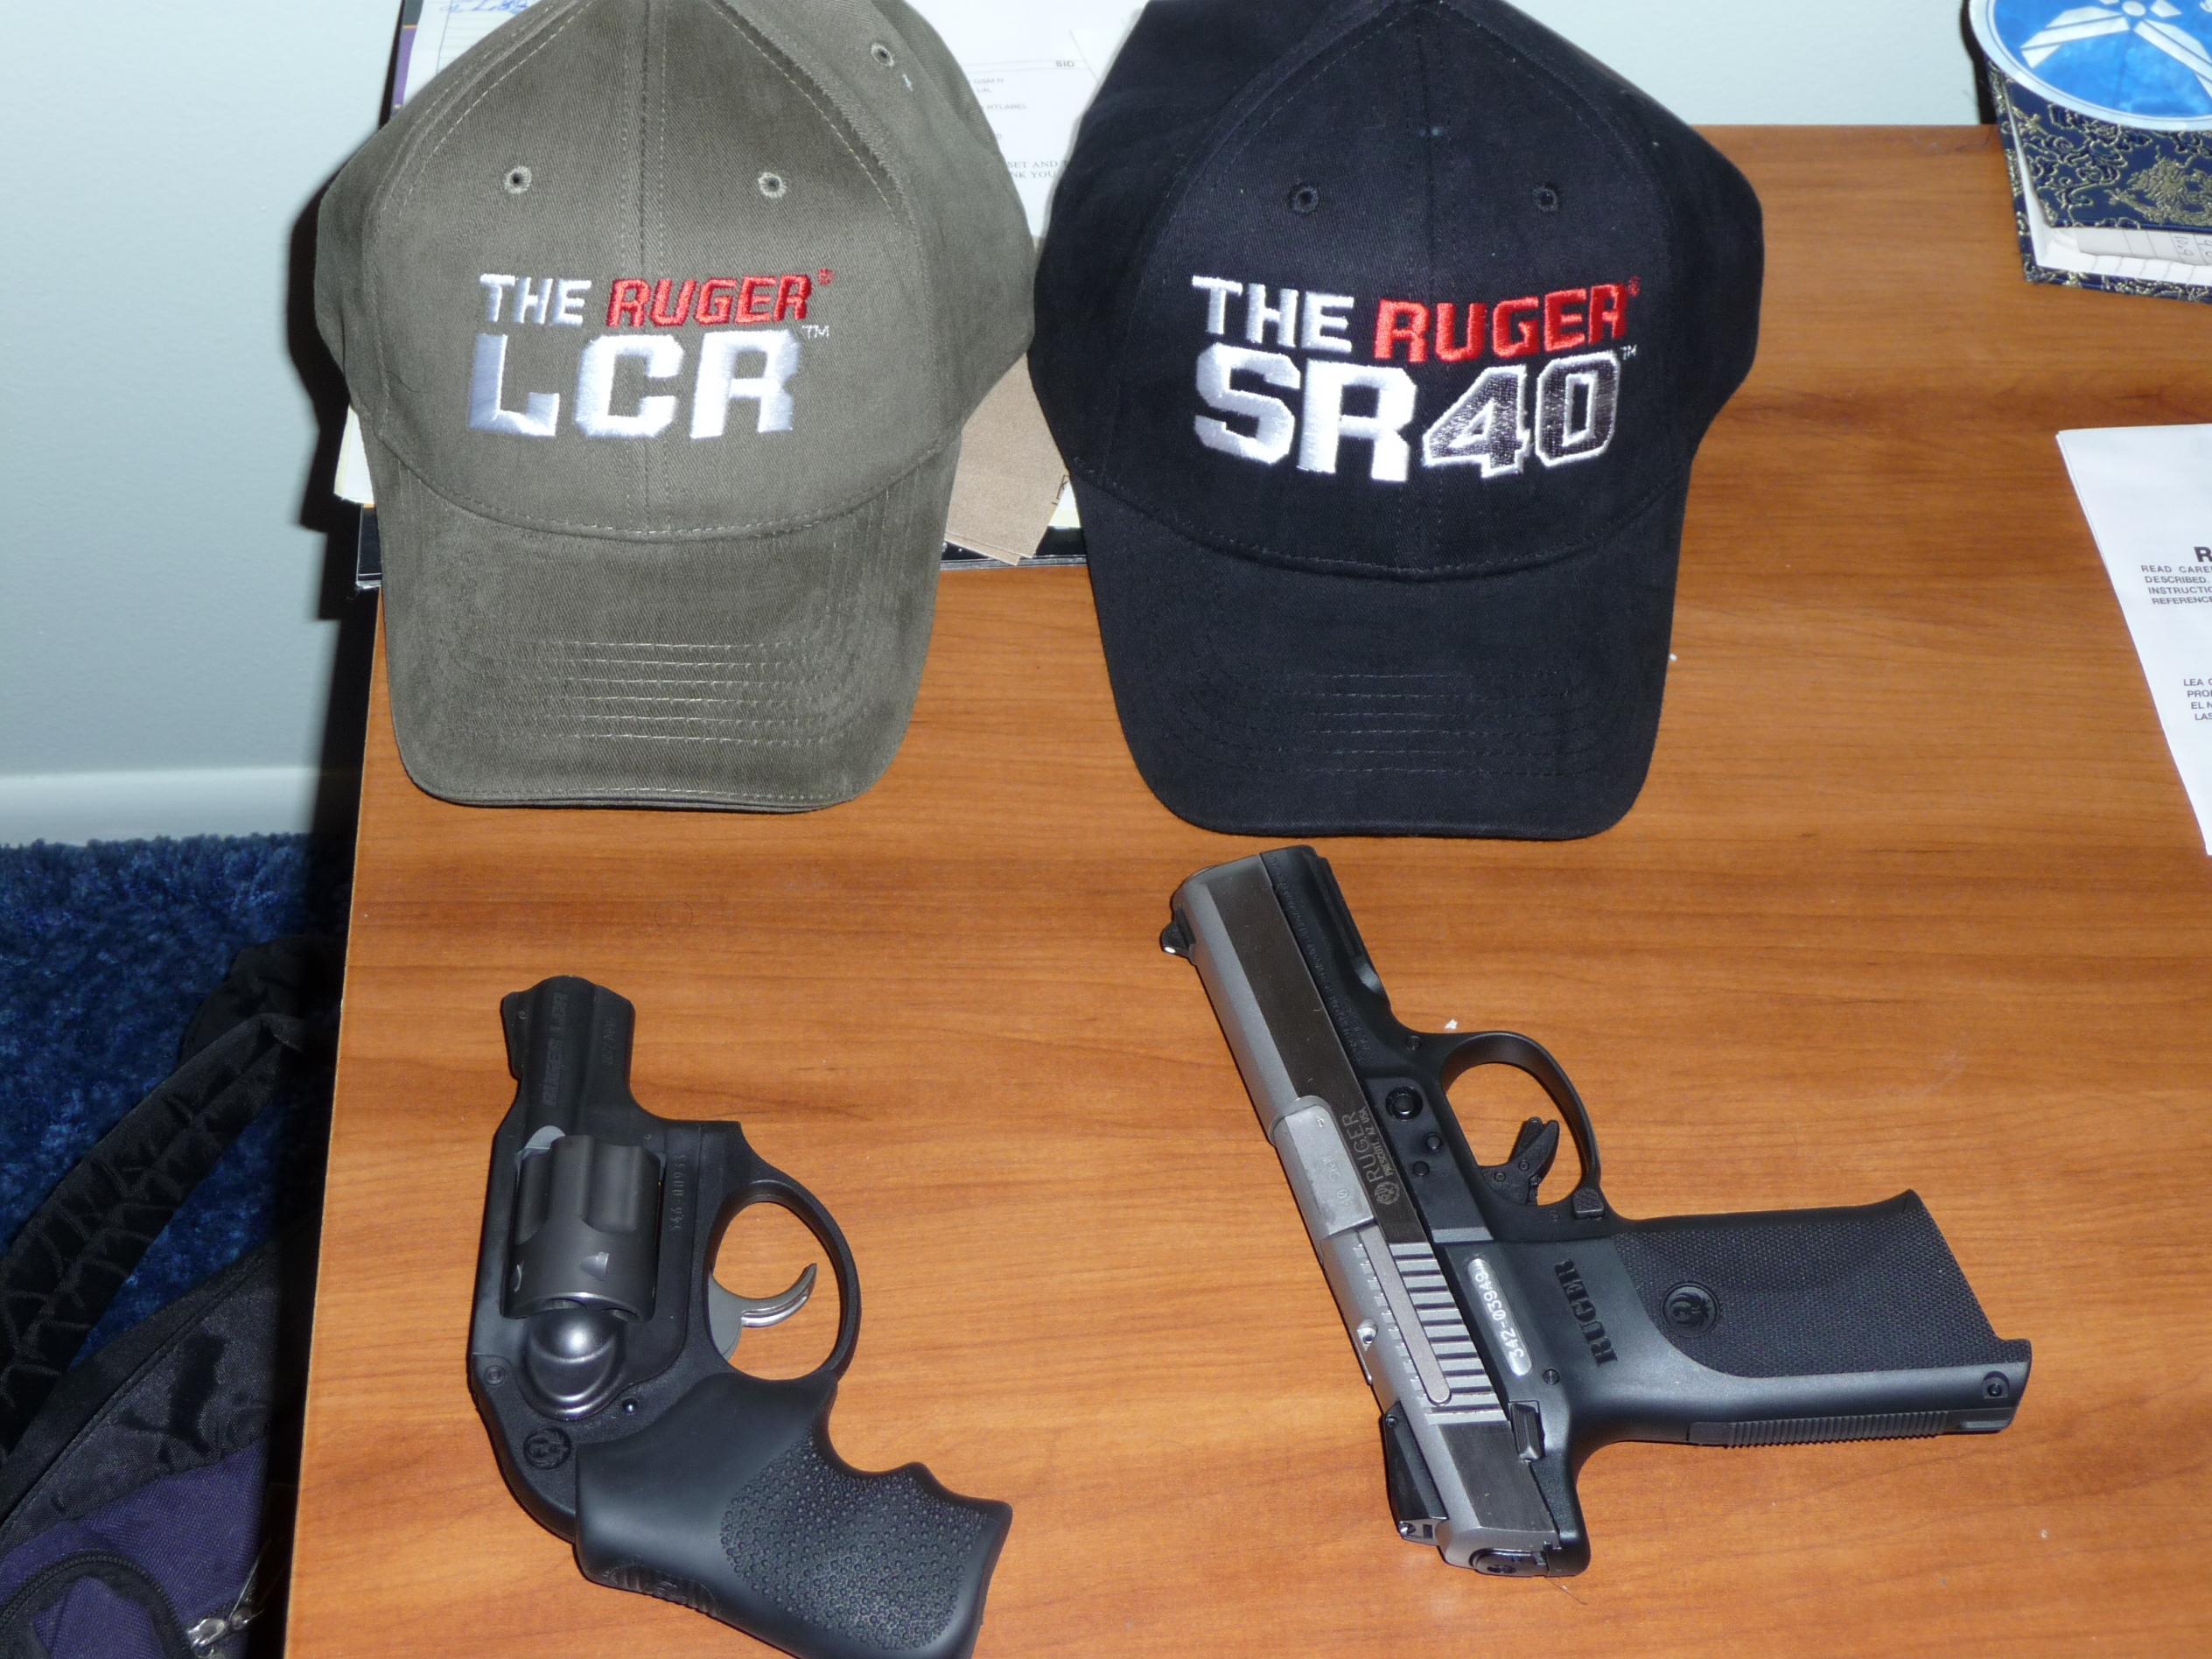 2 more Rugers & Range report-p1050333.jpg